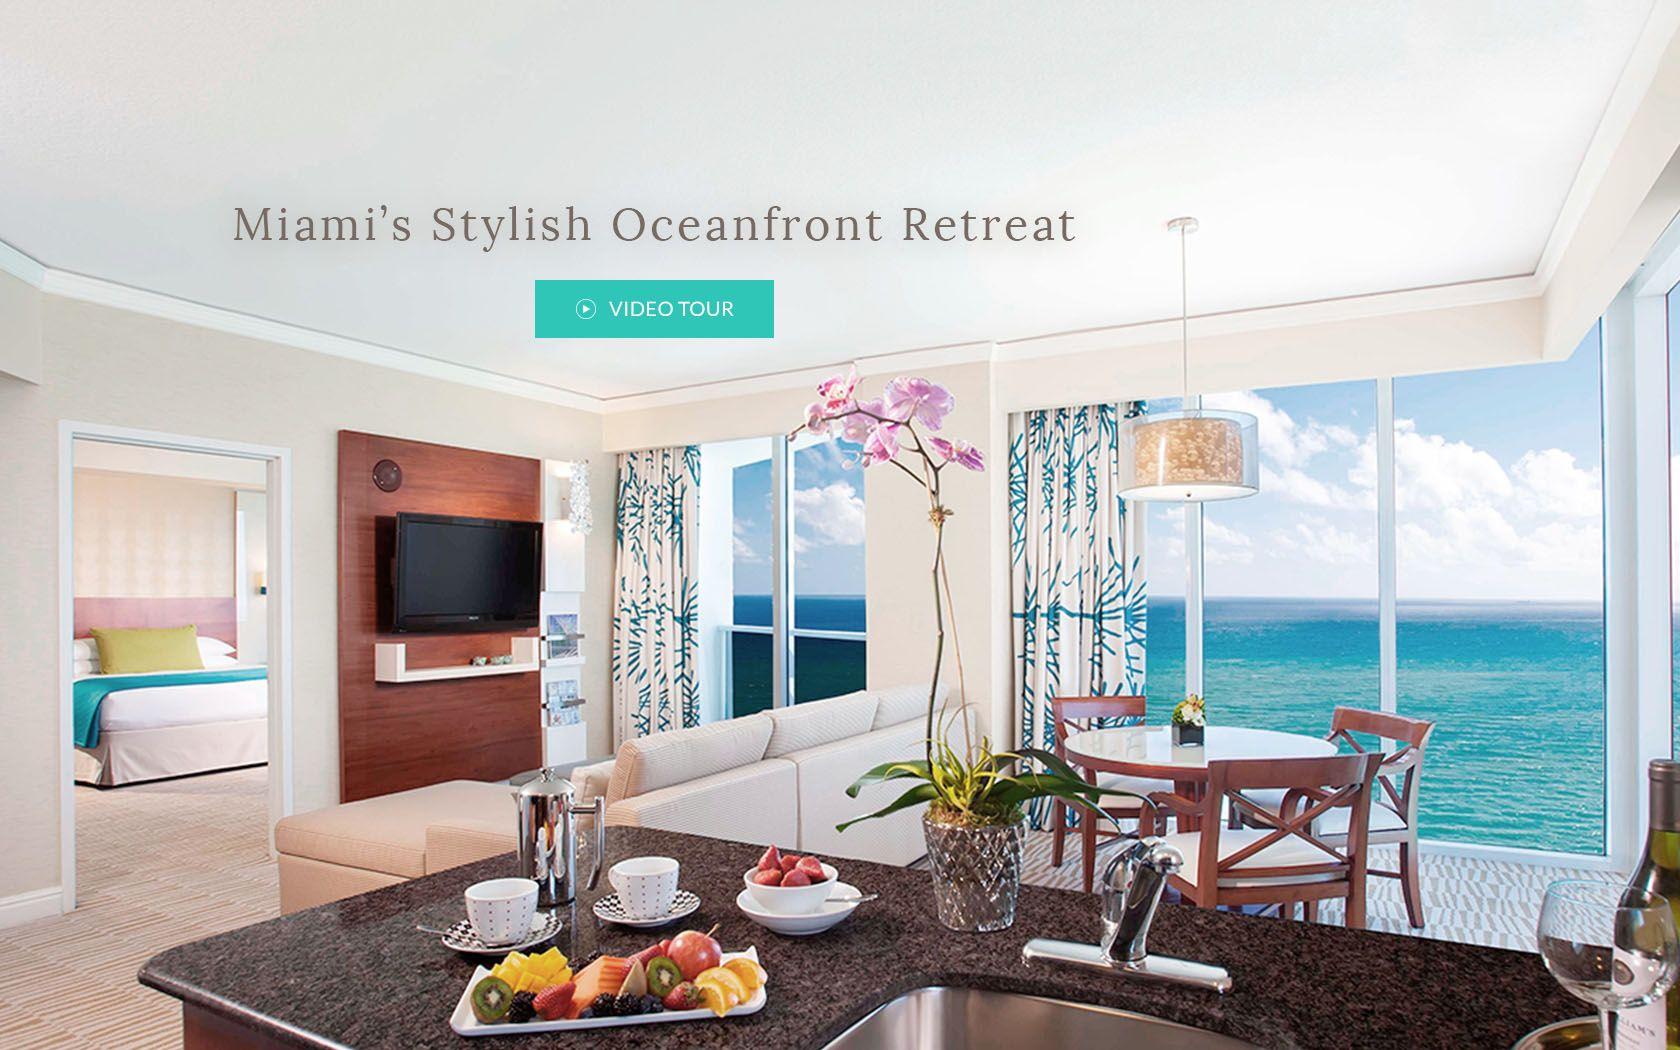 Trump Miami A Miami Hotel Where Lifestyle Meets Luxury Bedroom Suite Suites Condos For Sale